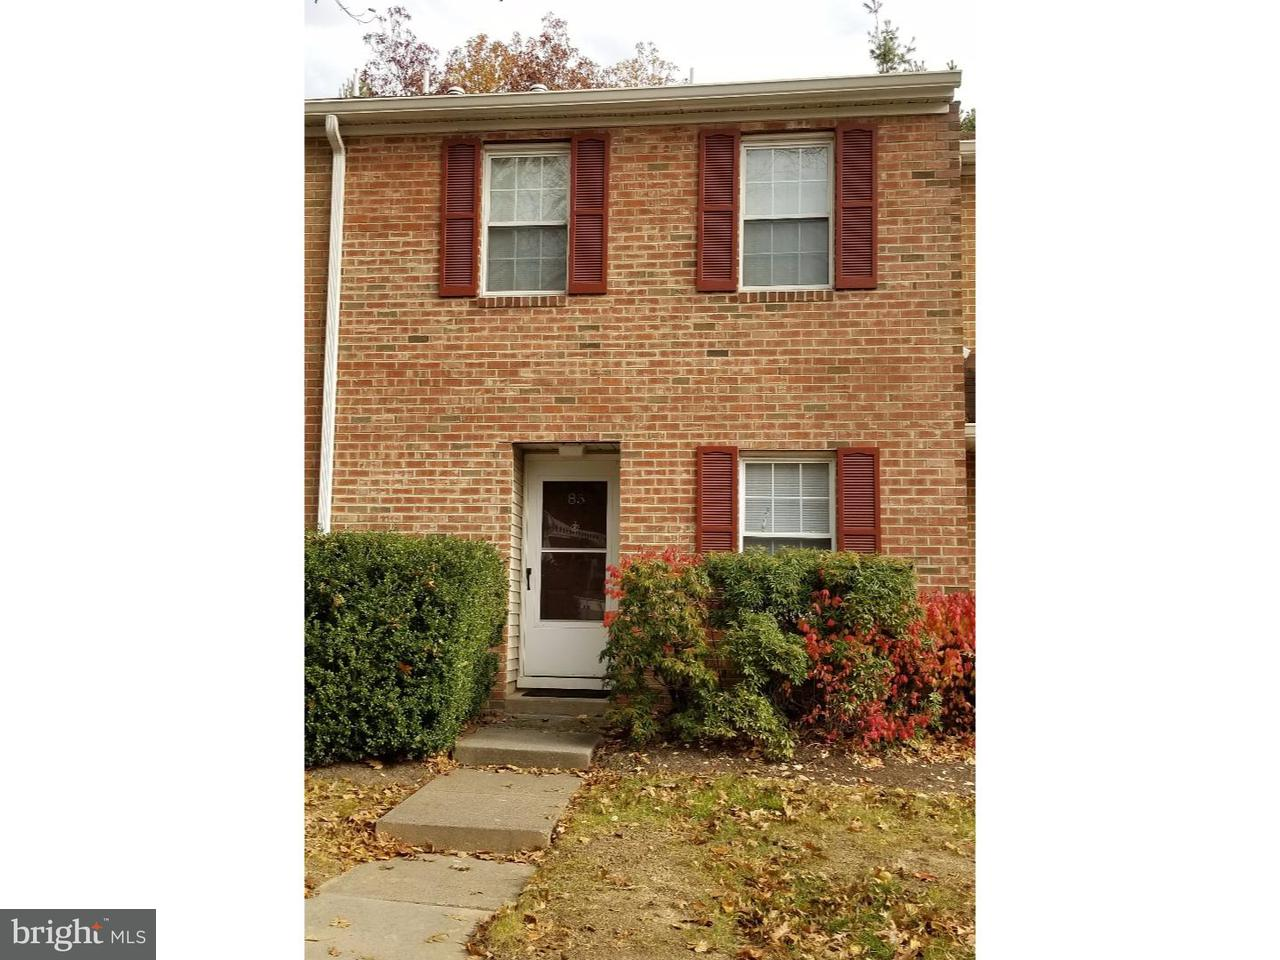 联栋屋 为 出租 在 85 QUINCE Court 劳伦斯维尔, 新泽西州 08648 美国在/周边: Lawrence Township